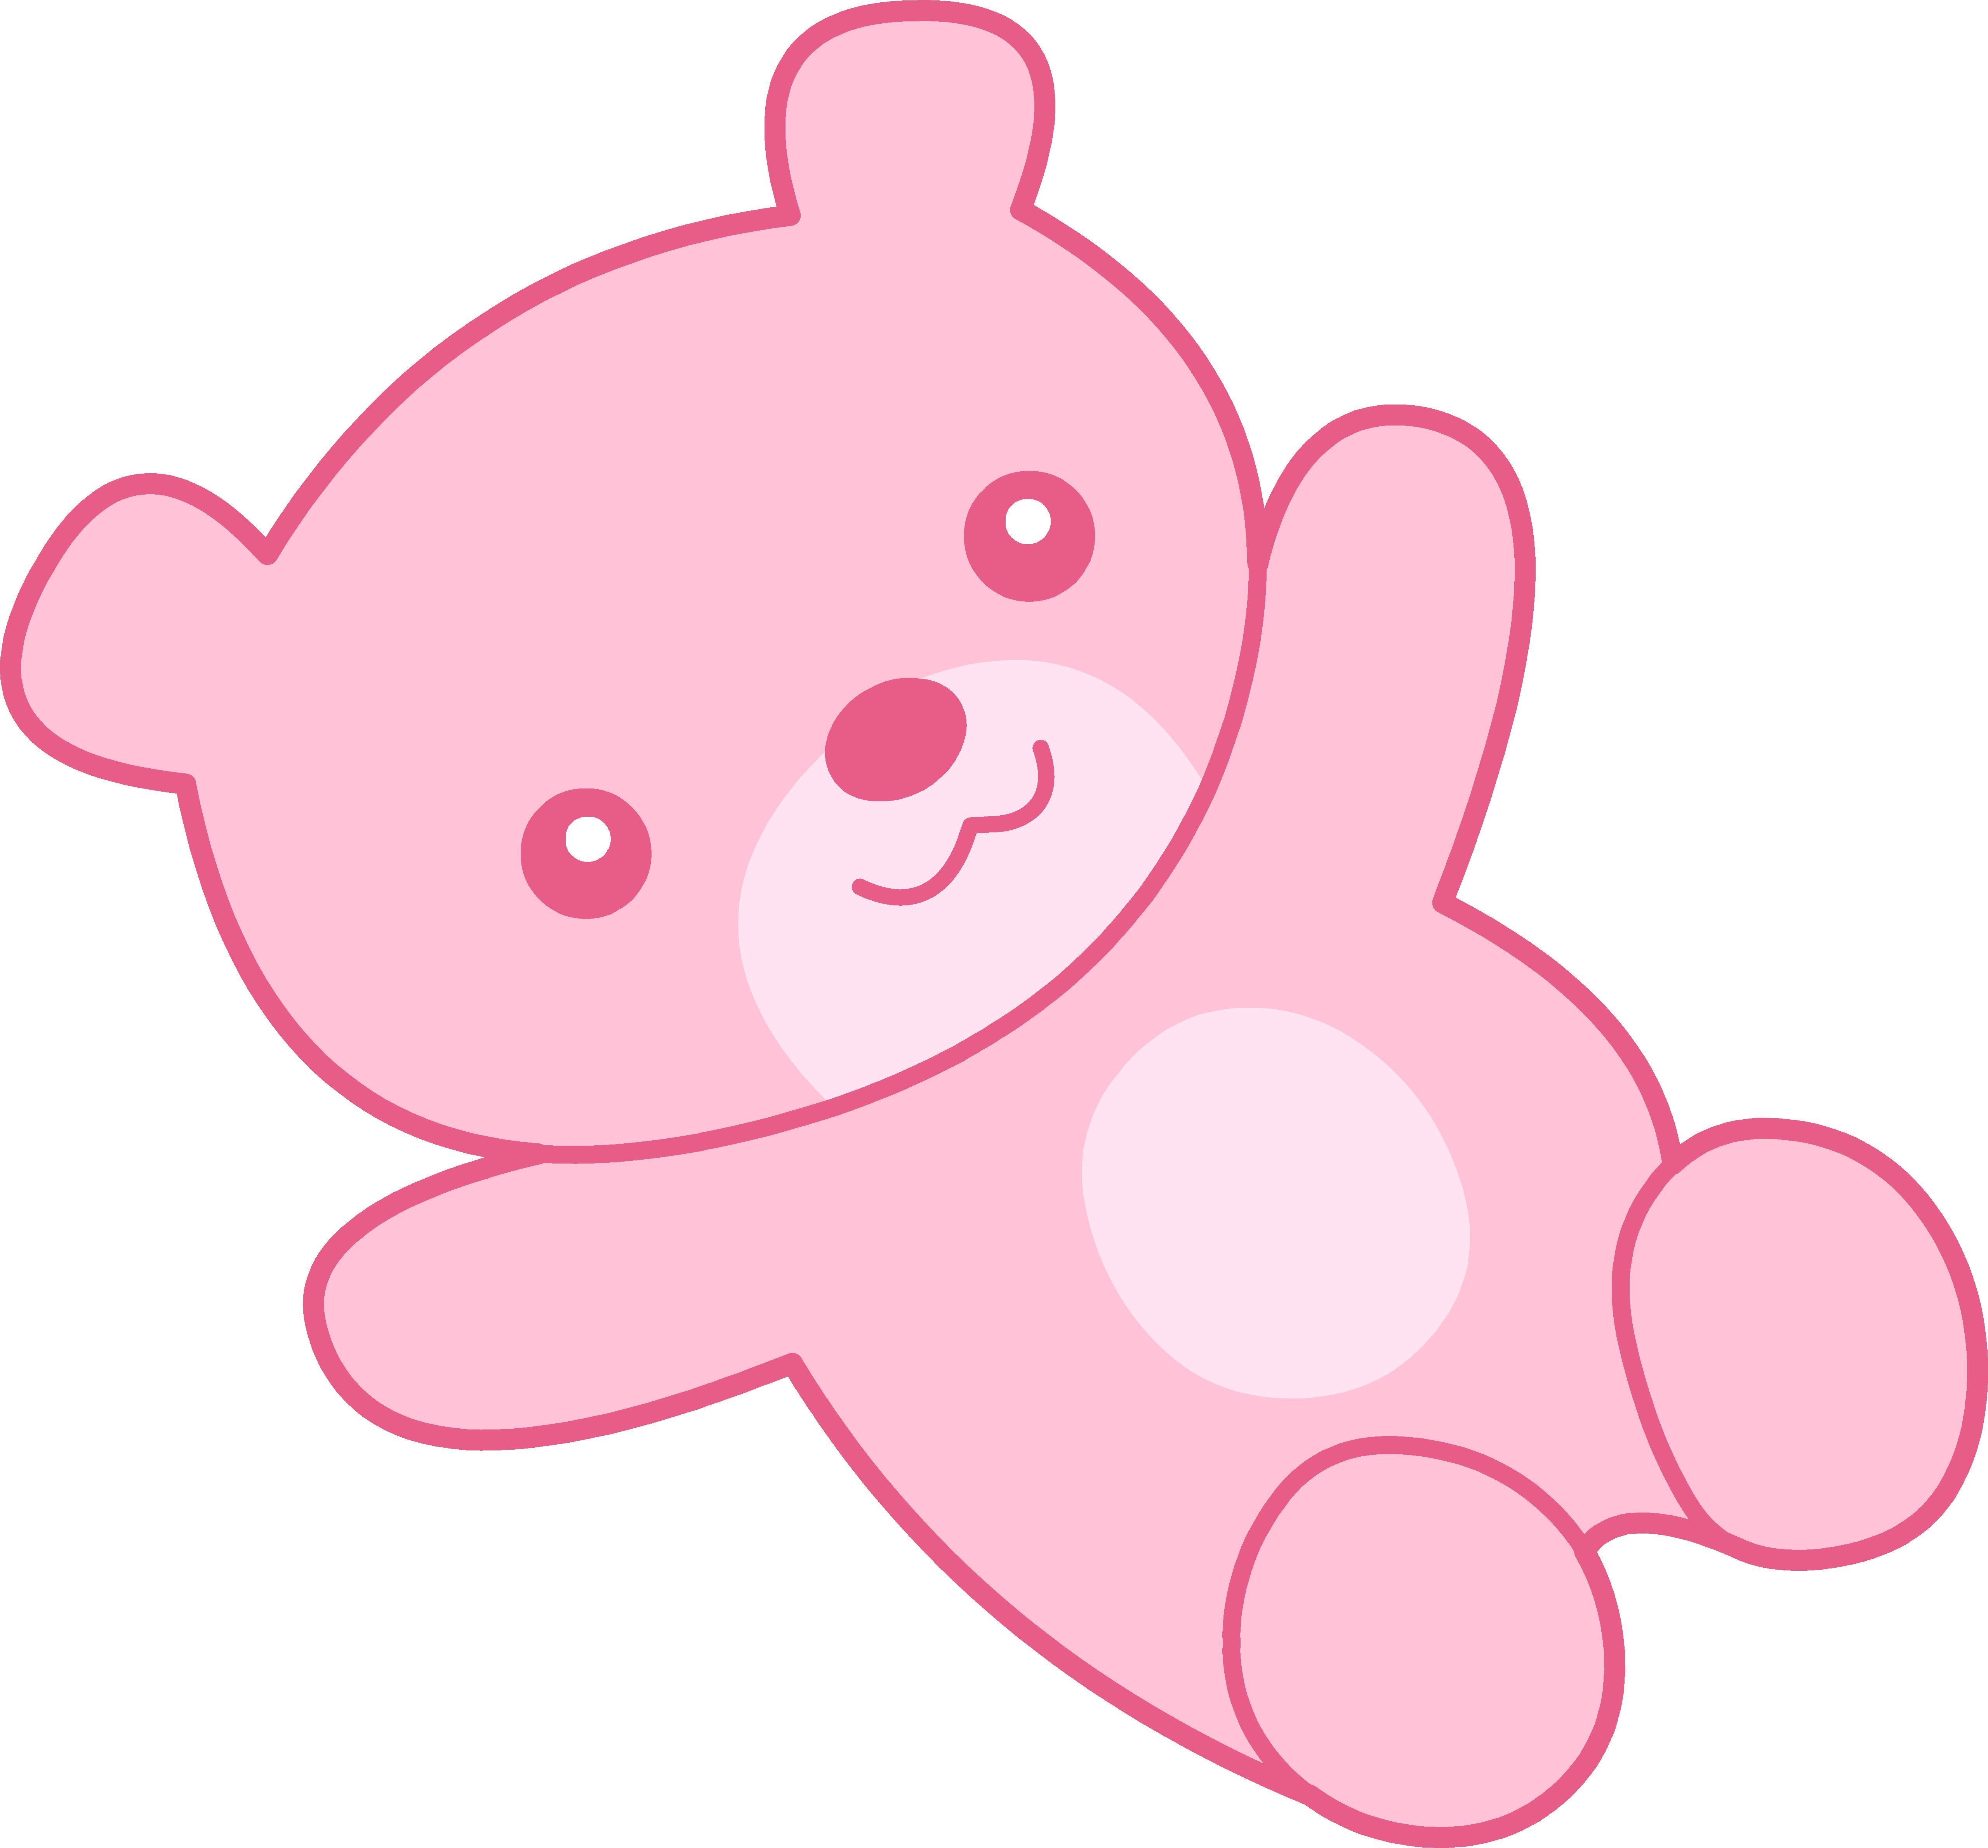 Cute Pink Teddy Bear Clipart.